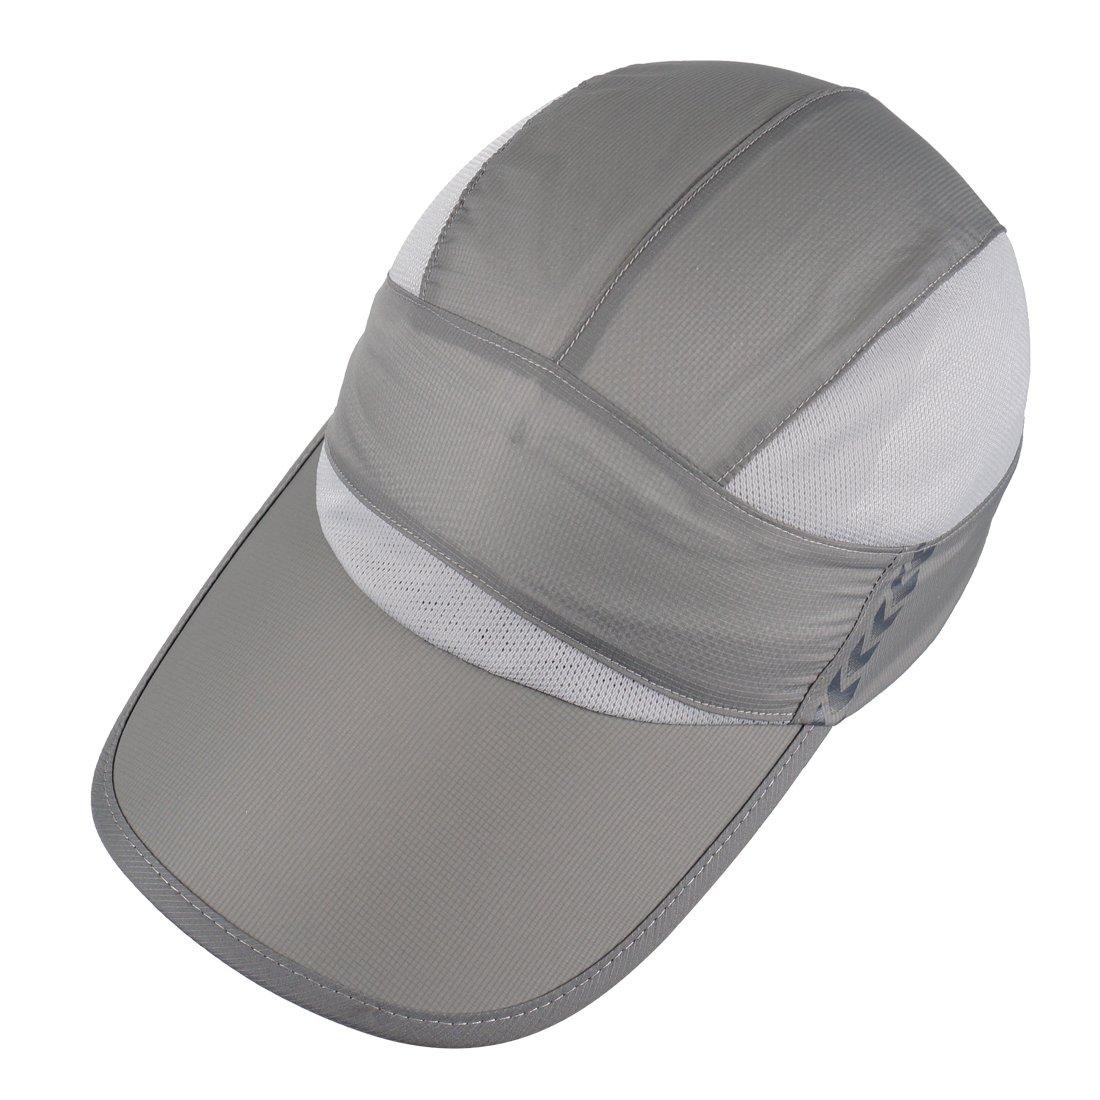 923c27eb5e9 GADIEMENSS Quick Dry Sports Hat Lightweight Breathable Soft Outdoor Running  Cap  (Classic series